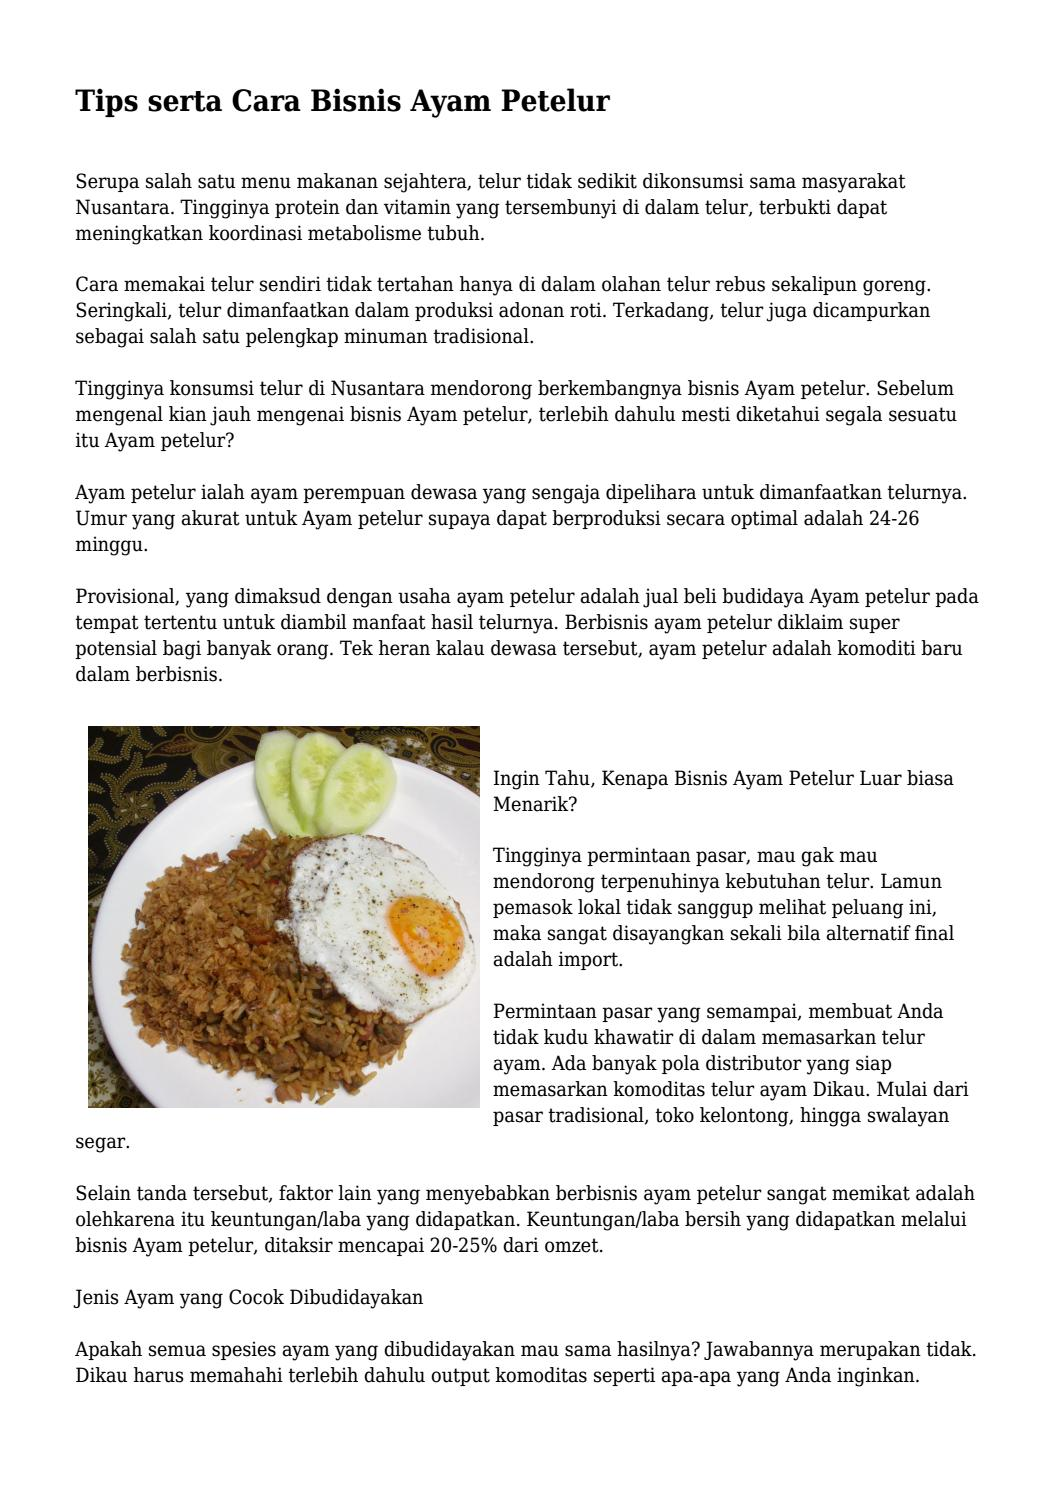 Tips Serta Cara Bisnis Ayam Petelur By Klikgayahidupnet Issuu